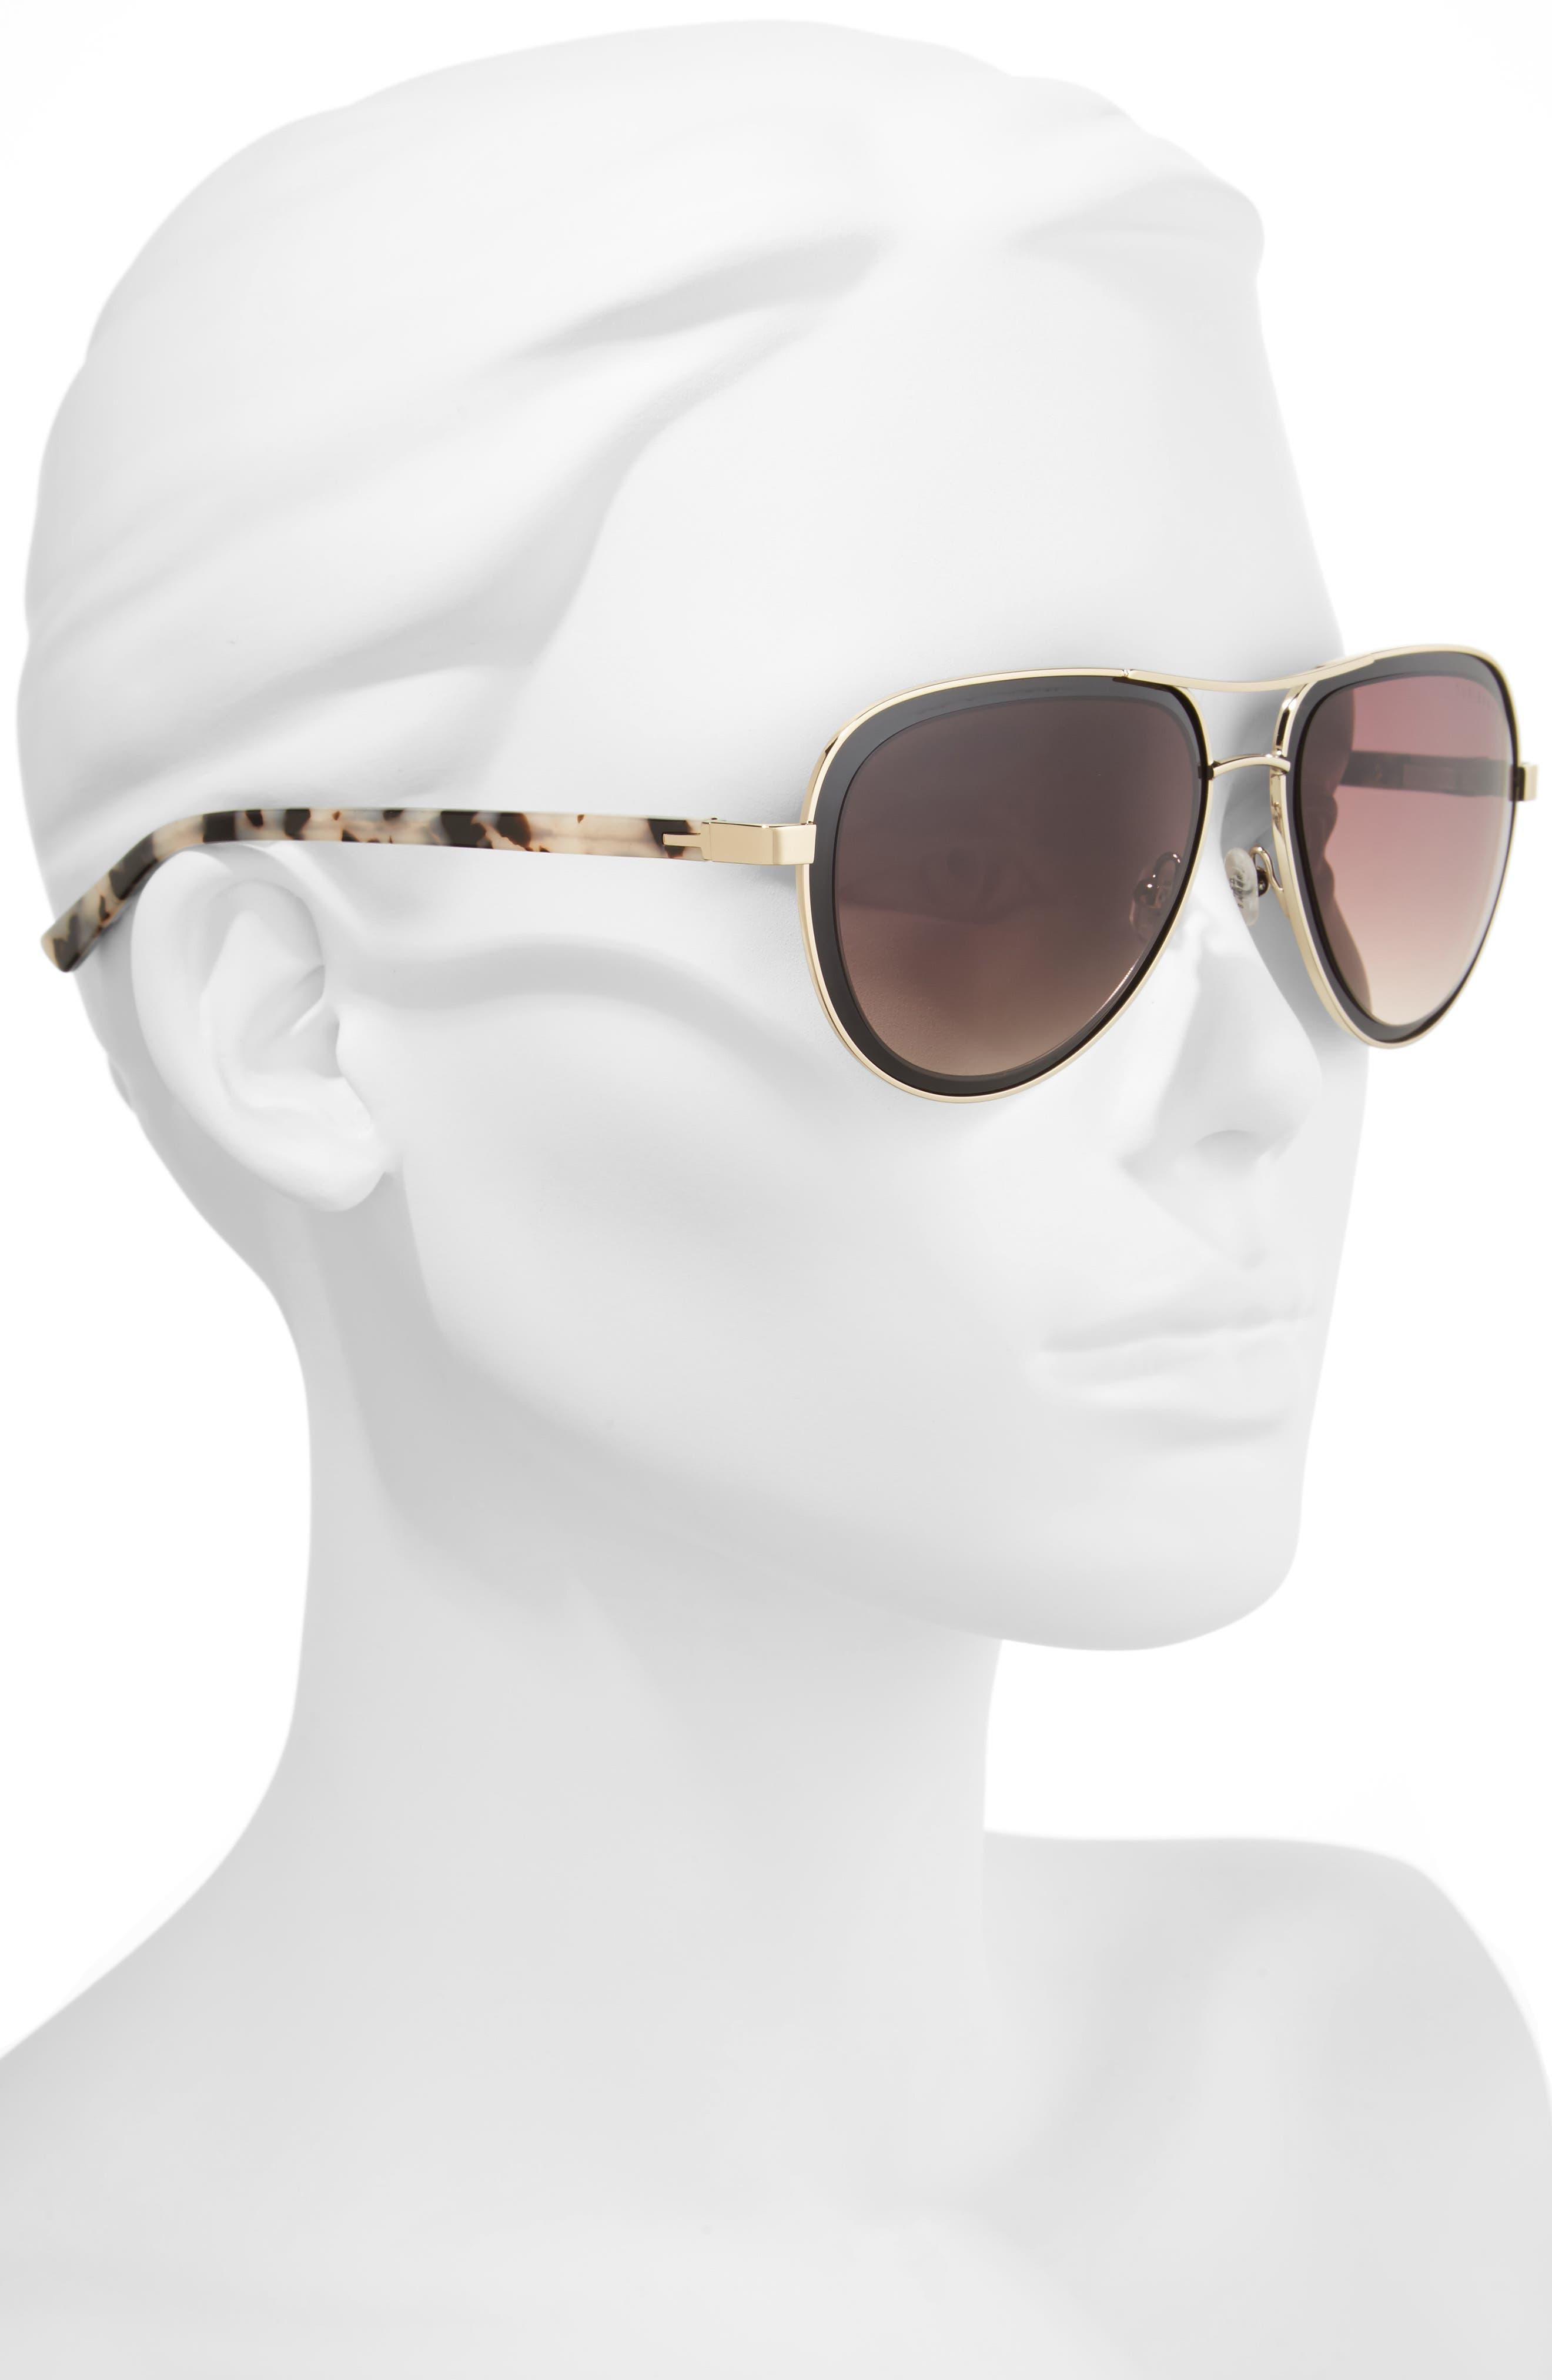 54mm Aviator Sunglasses,                             Alternate thumbnail 2, color,                             Black